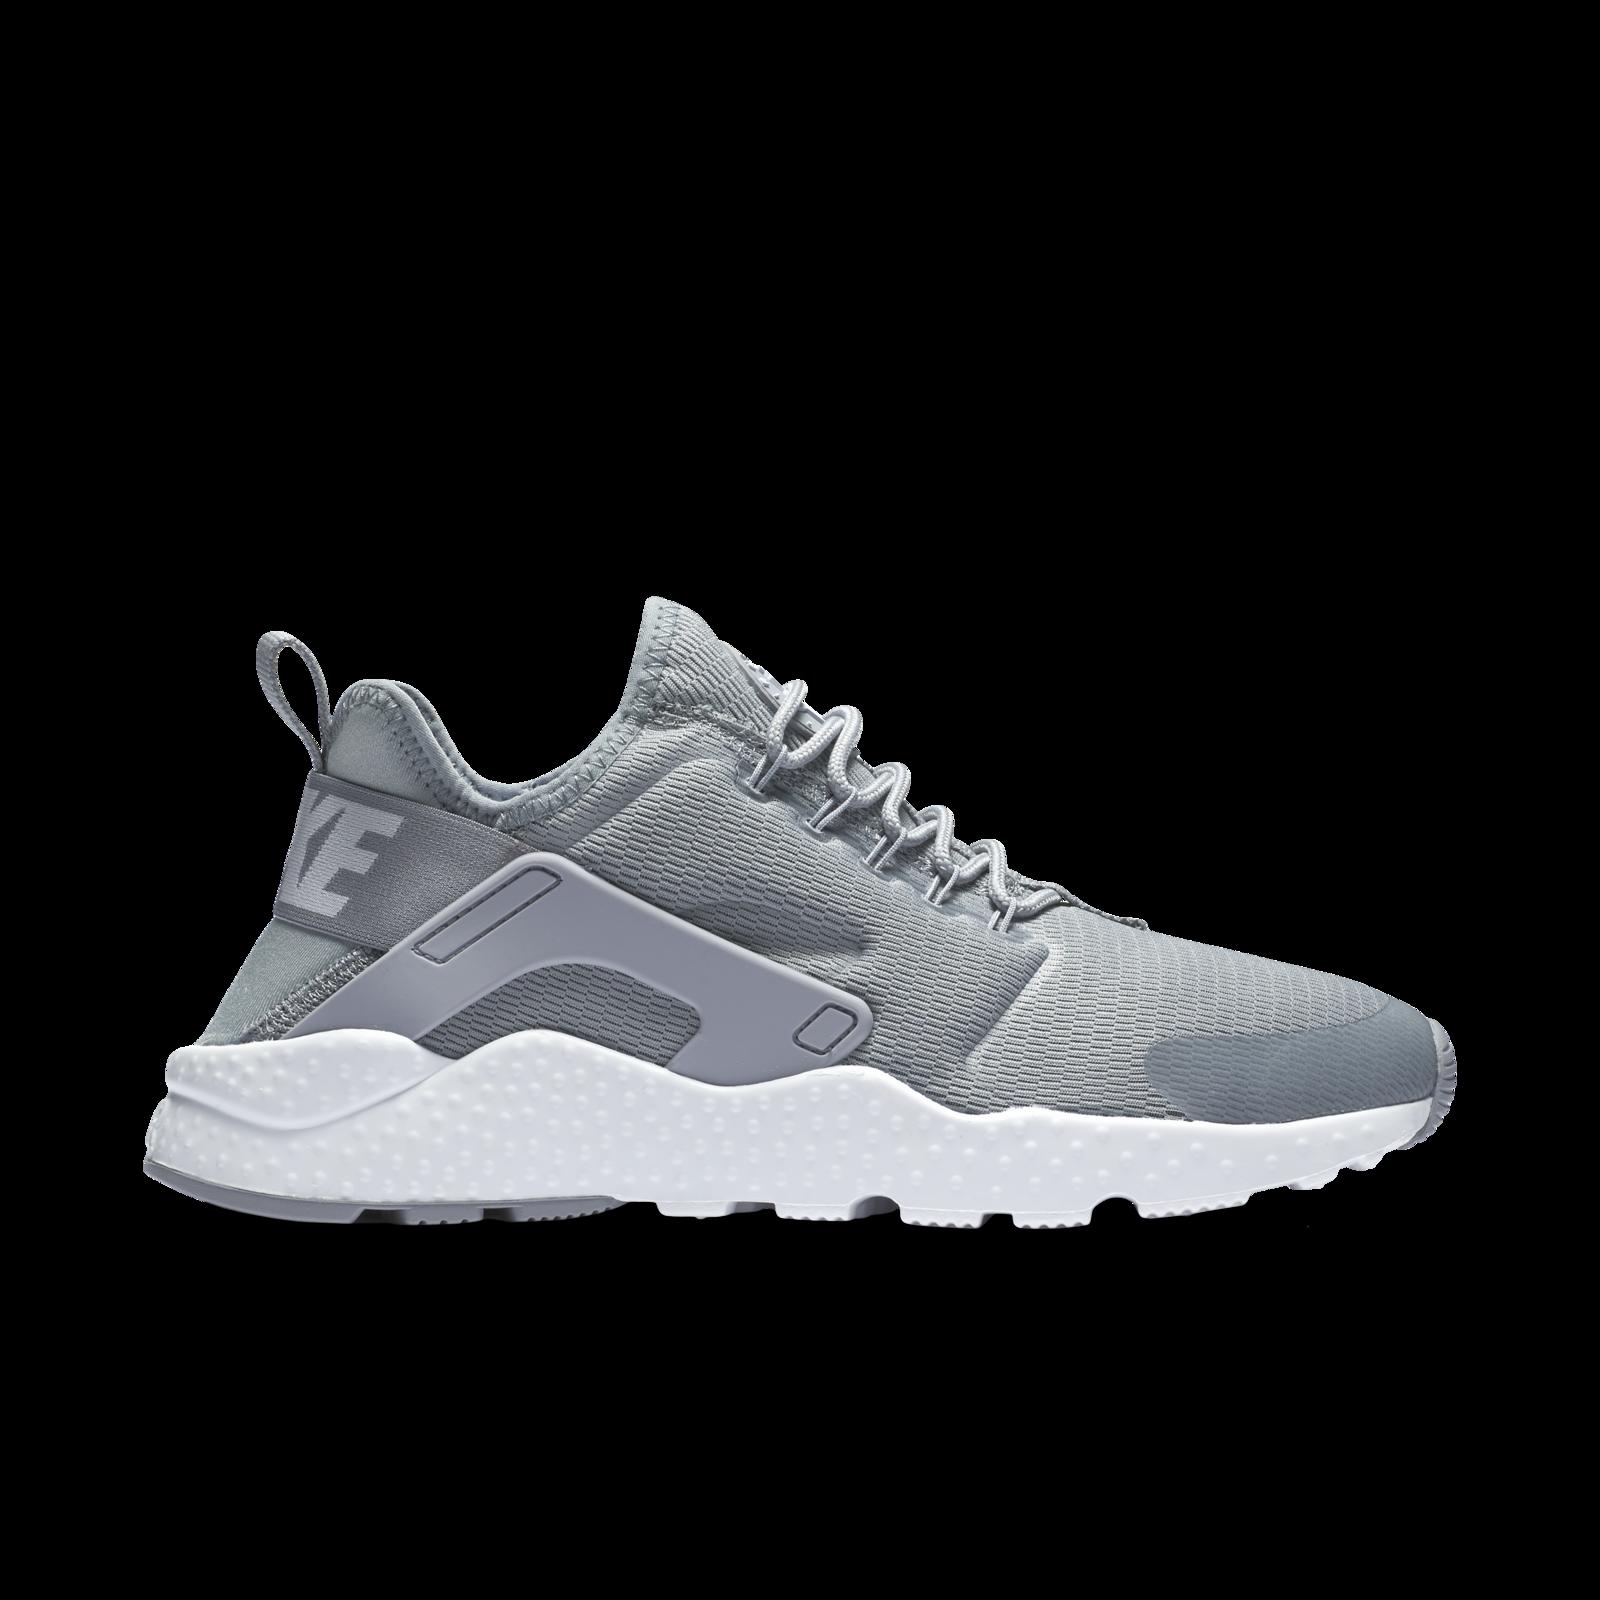 Nike Air Huarache Ultra Womens Shoes White